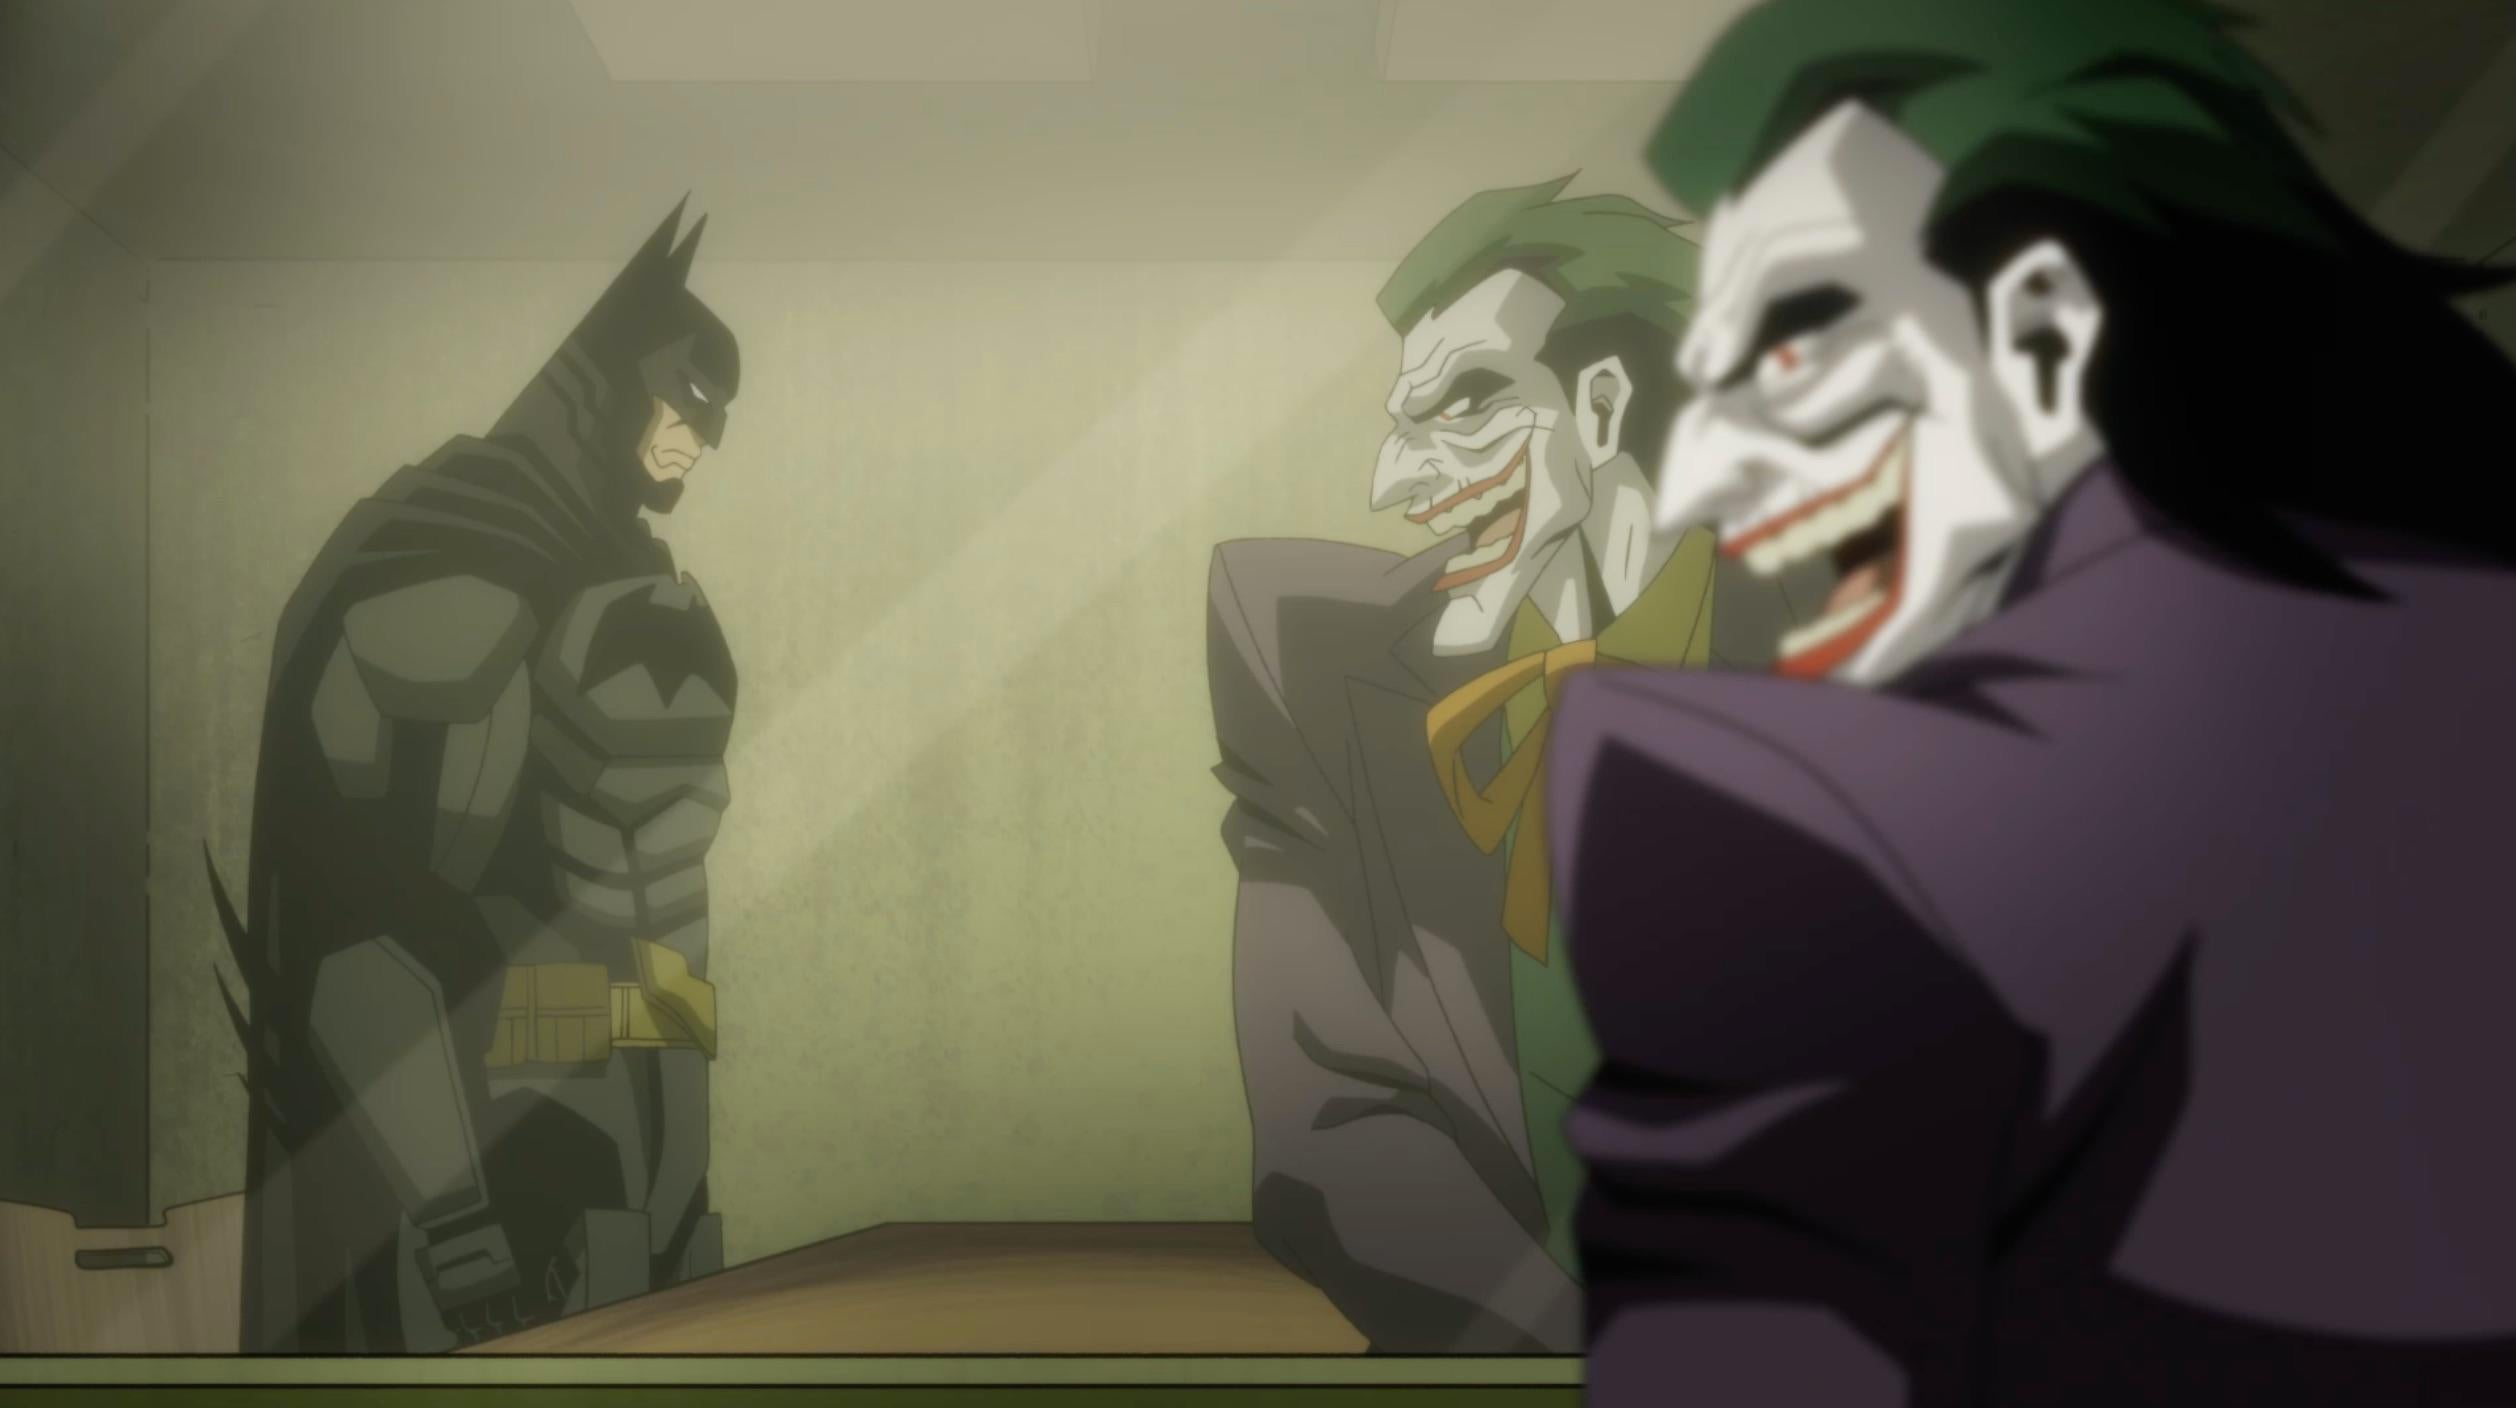 inj-bat-joker-2.jpg